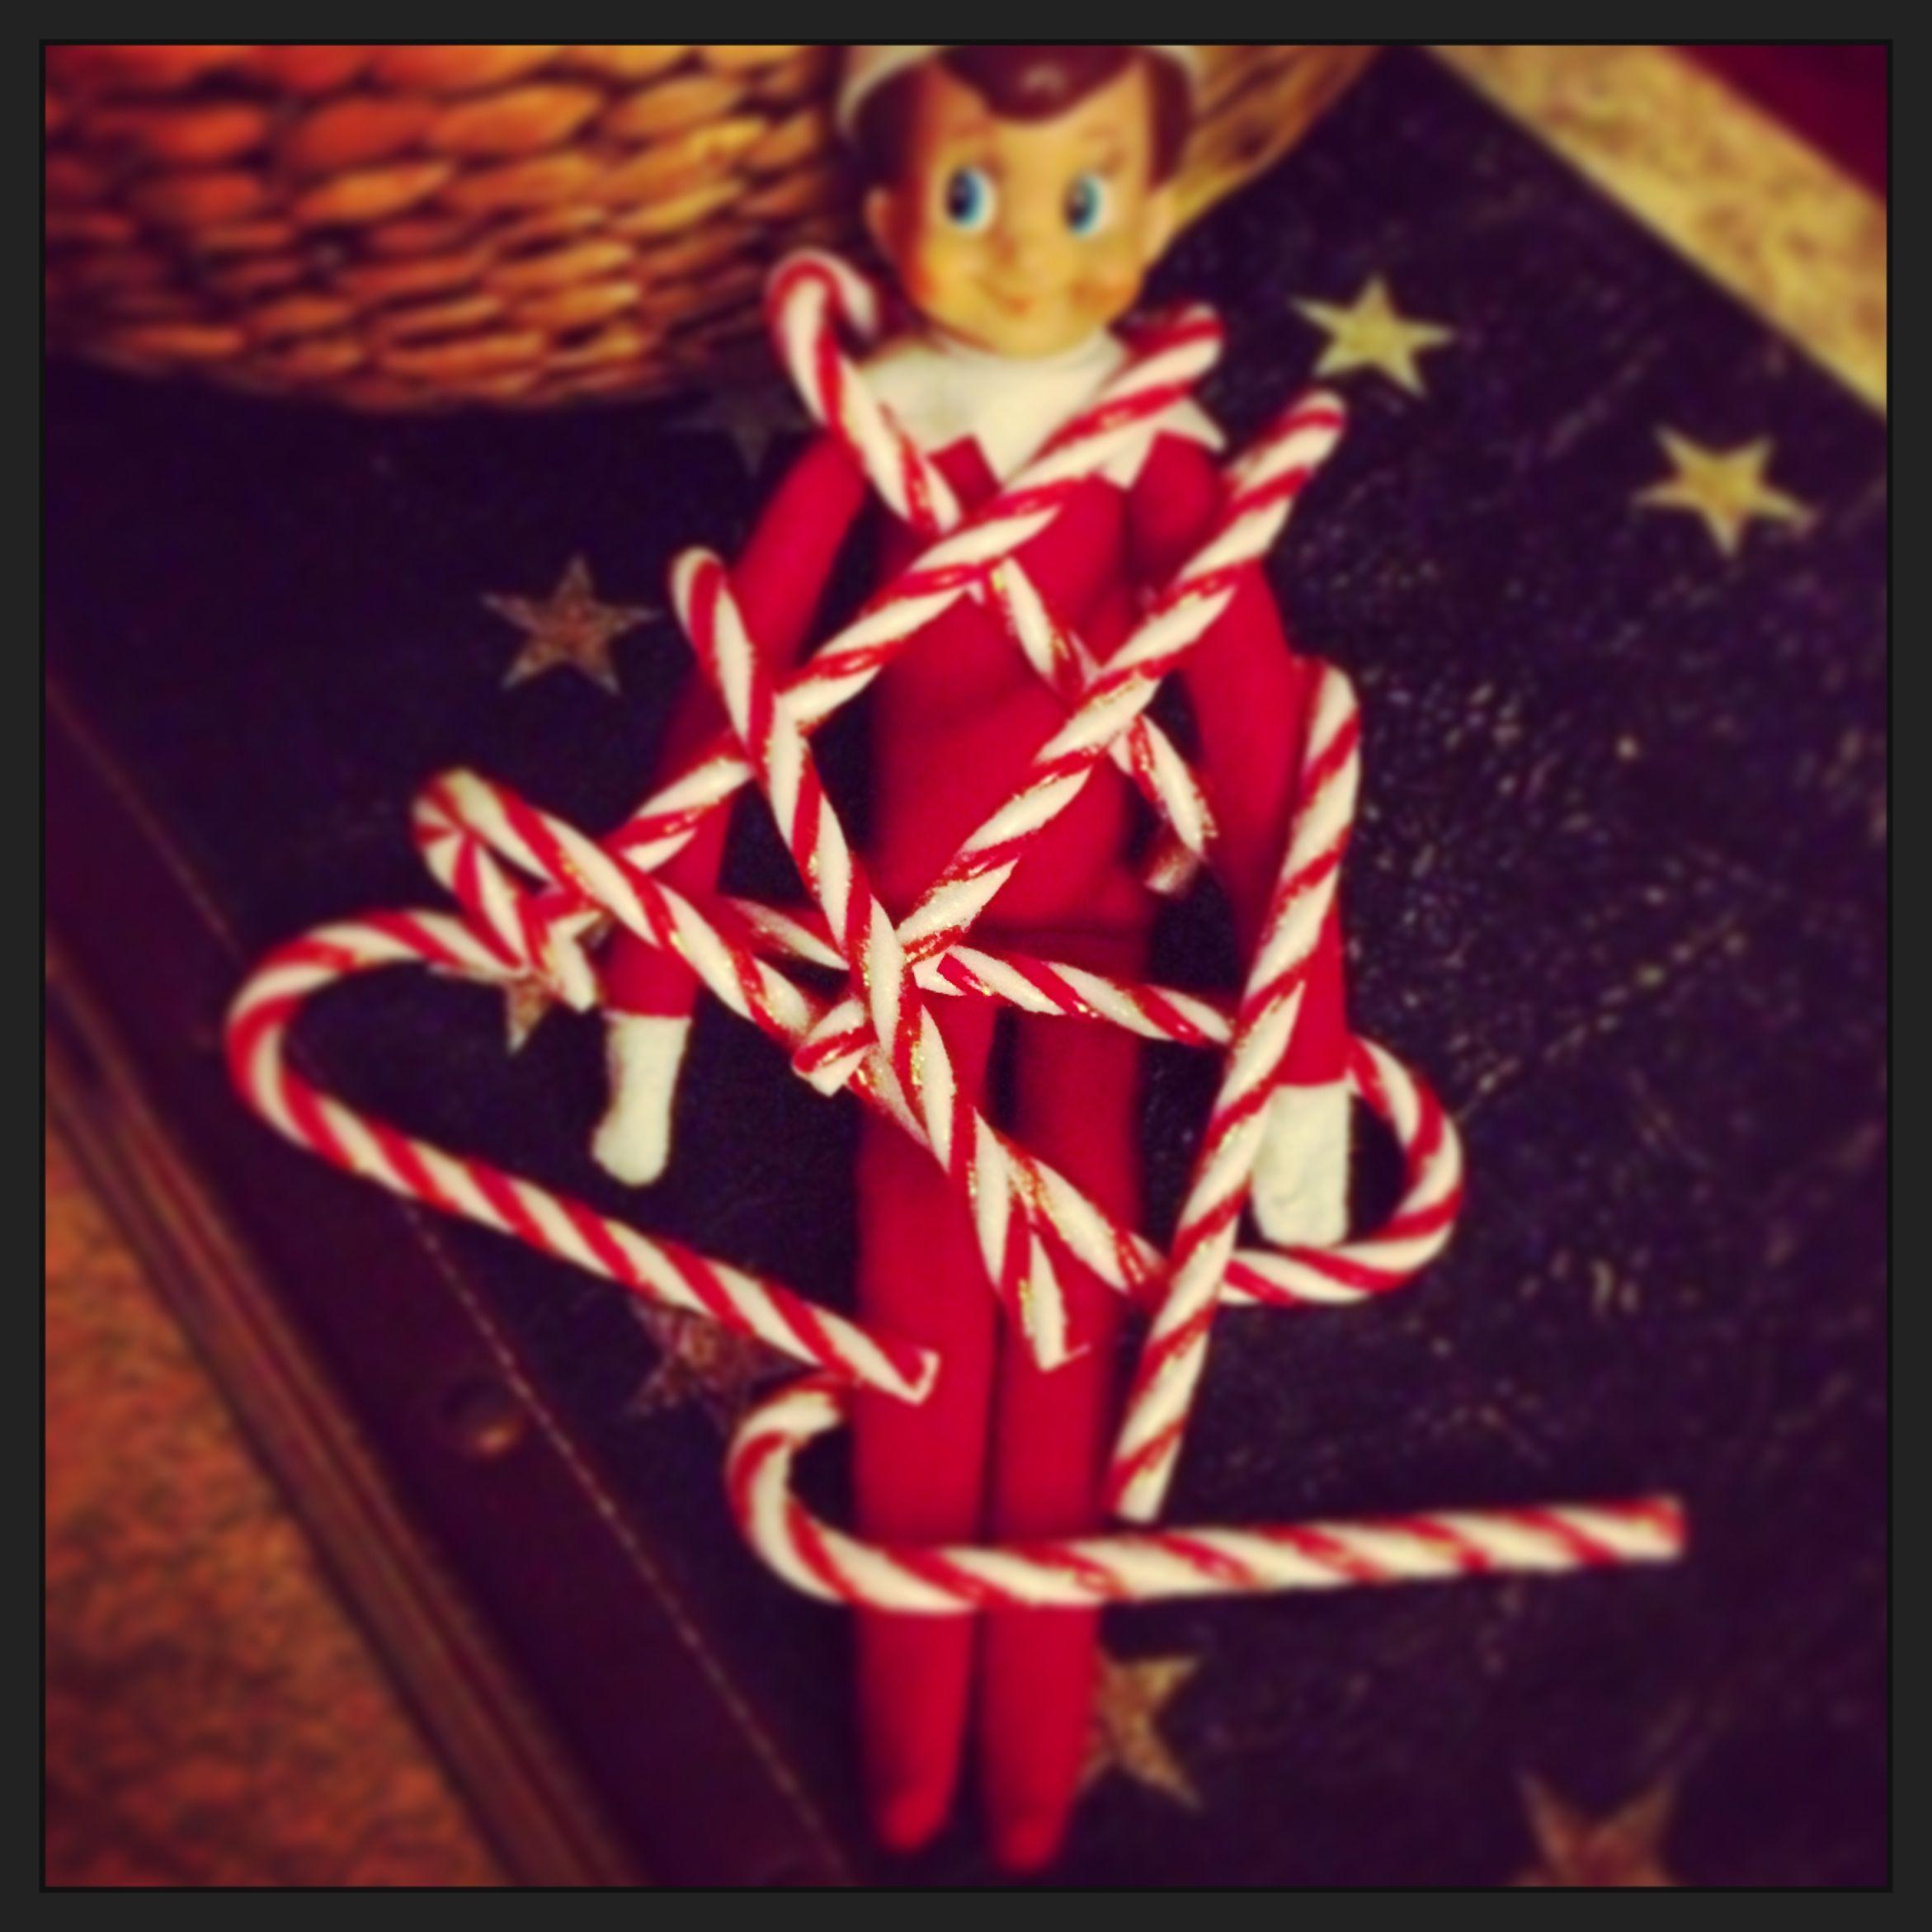 Elf on shelf!